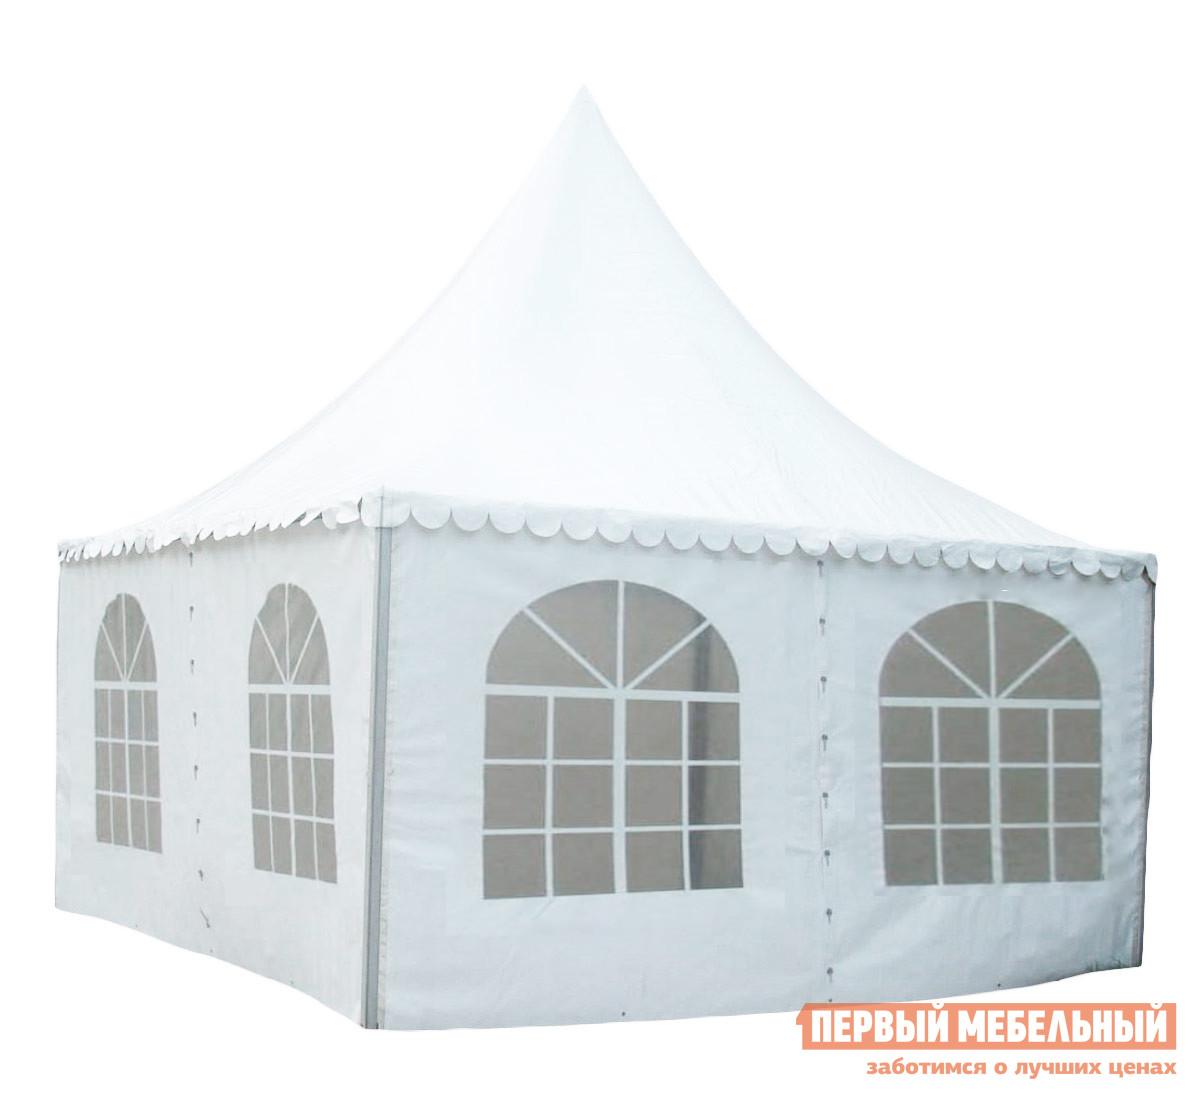 купить Шатер-пагода 5х5 для мероприятий Giza Garden Азарина 5х5 недорого